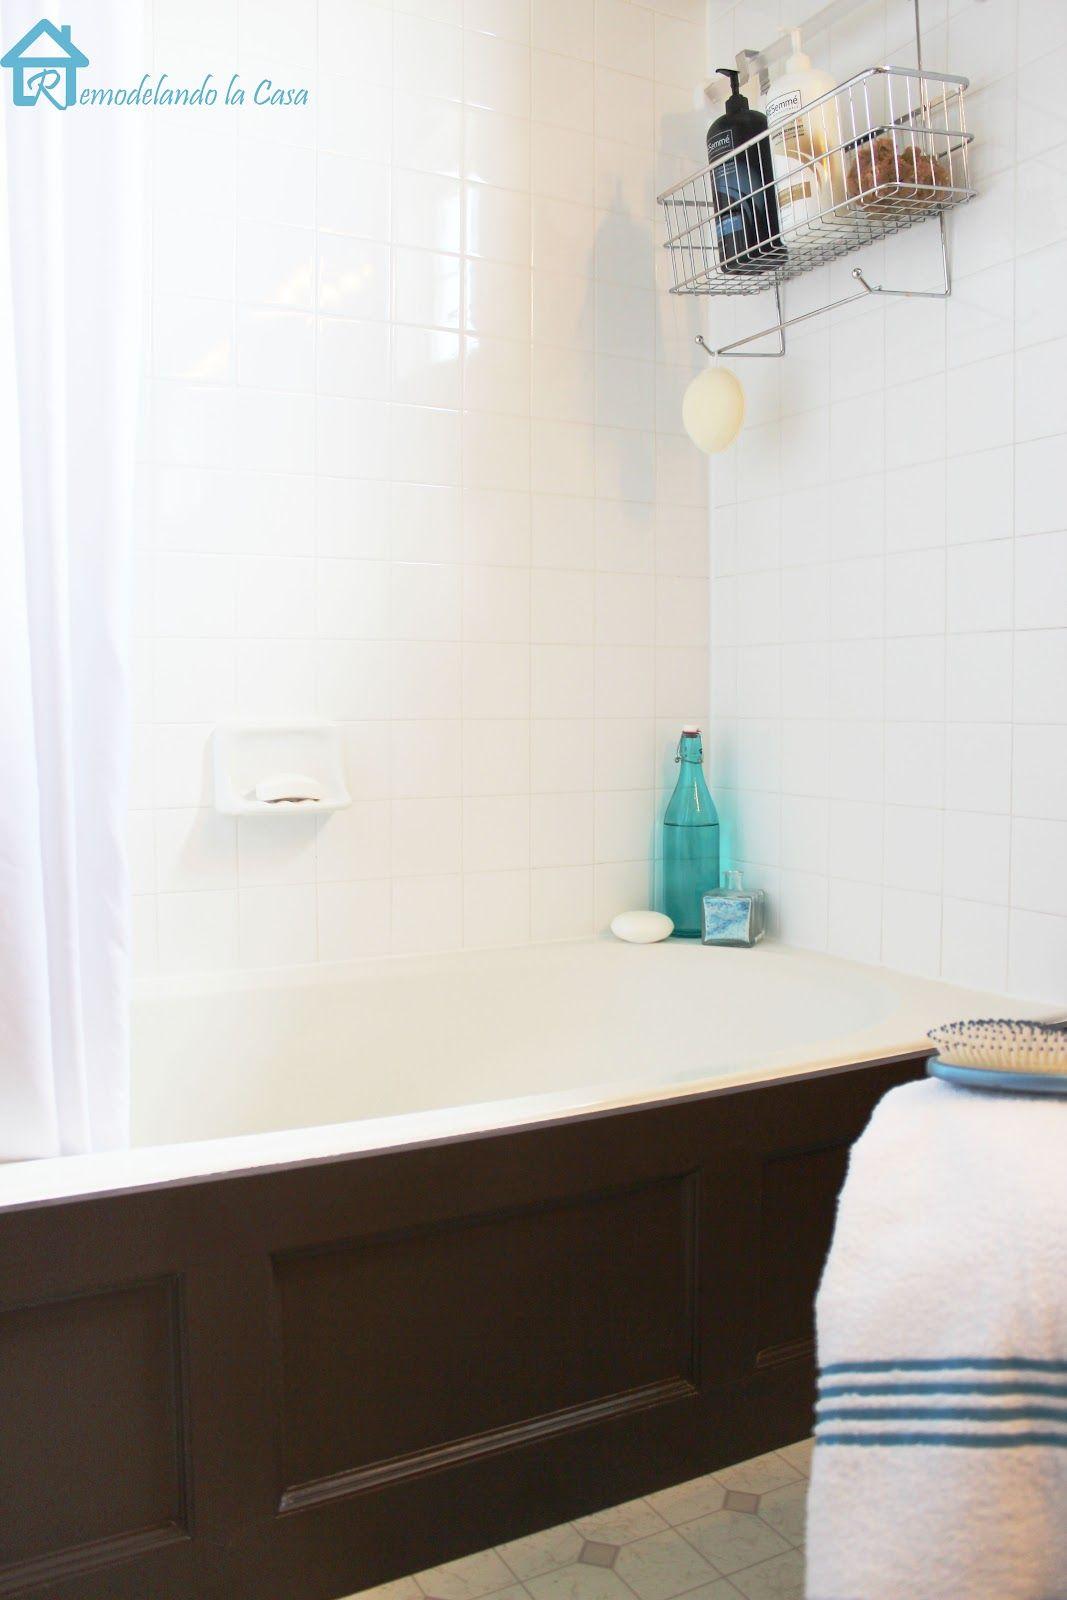 Bathtub Wood Panel Cover | Bathtubs, Woods and Bathtub cover